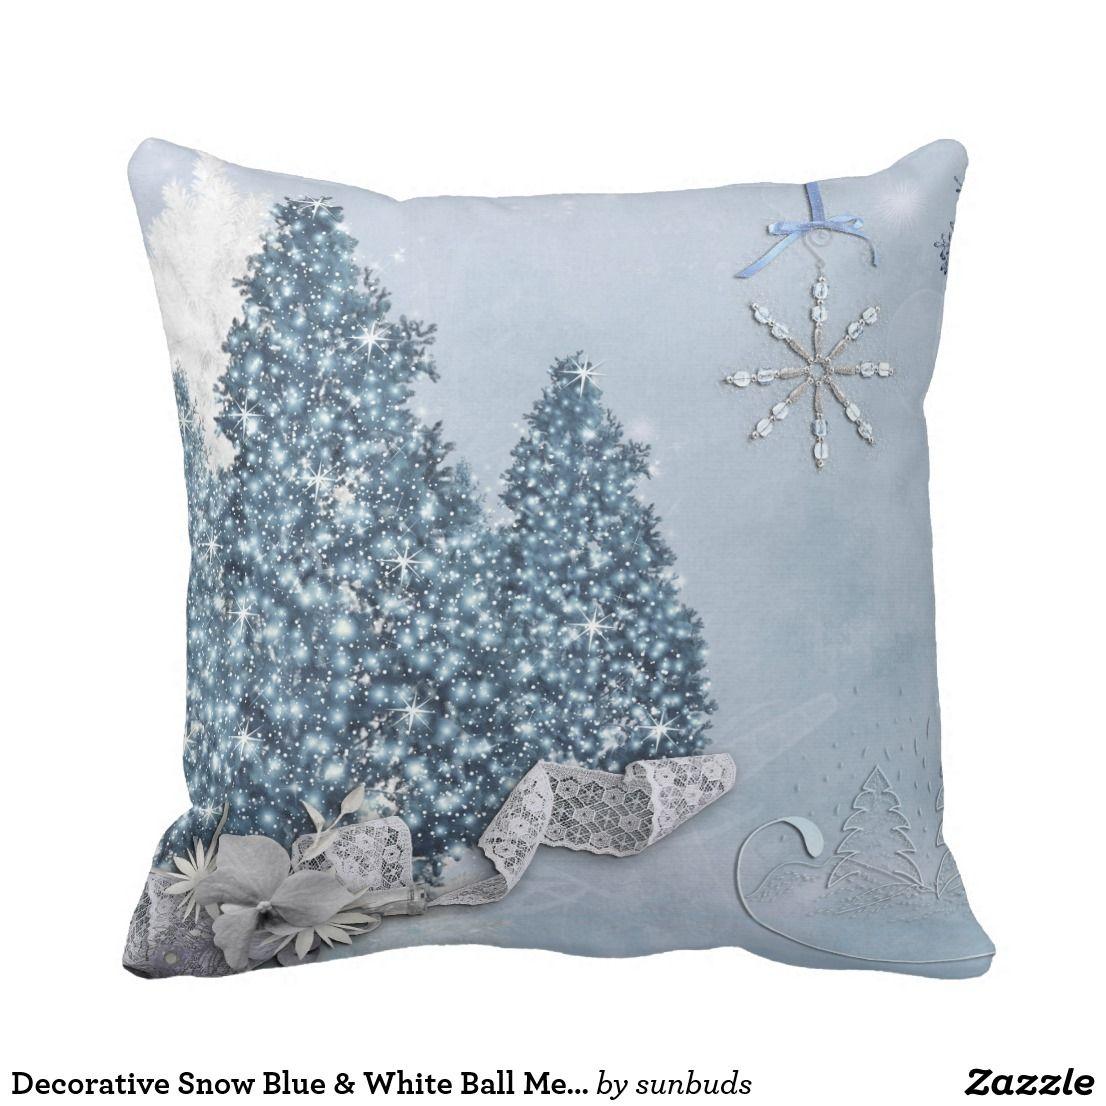 Decorative Snow Blue White Ball Merry Christmas Throw Pillow Zazzle Com Decorative Pillows Christmas Throw Pillows Christmas White Christmas Decor